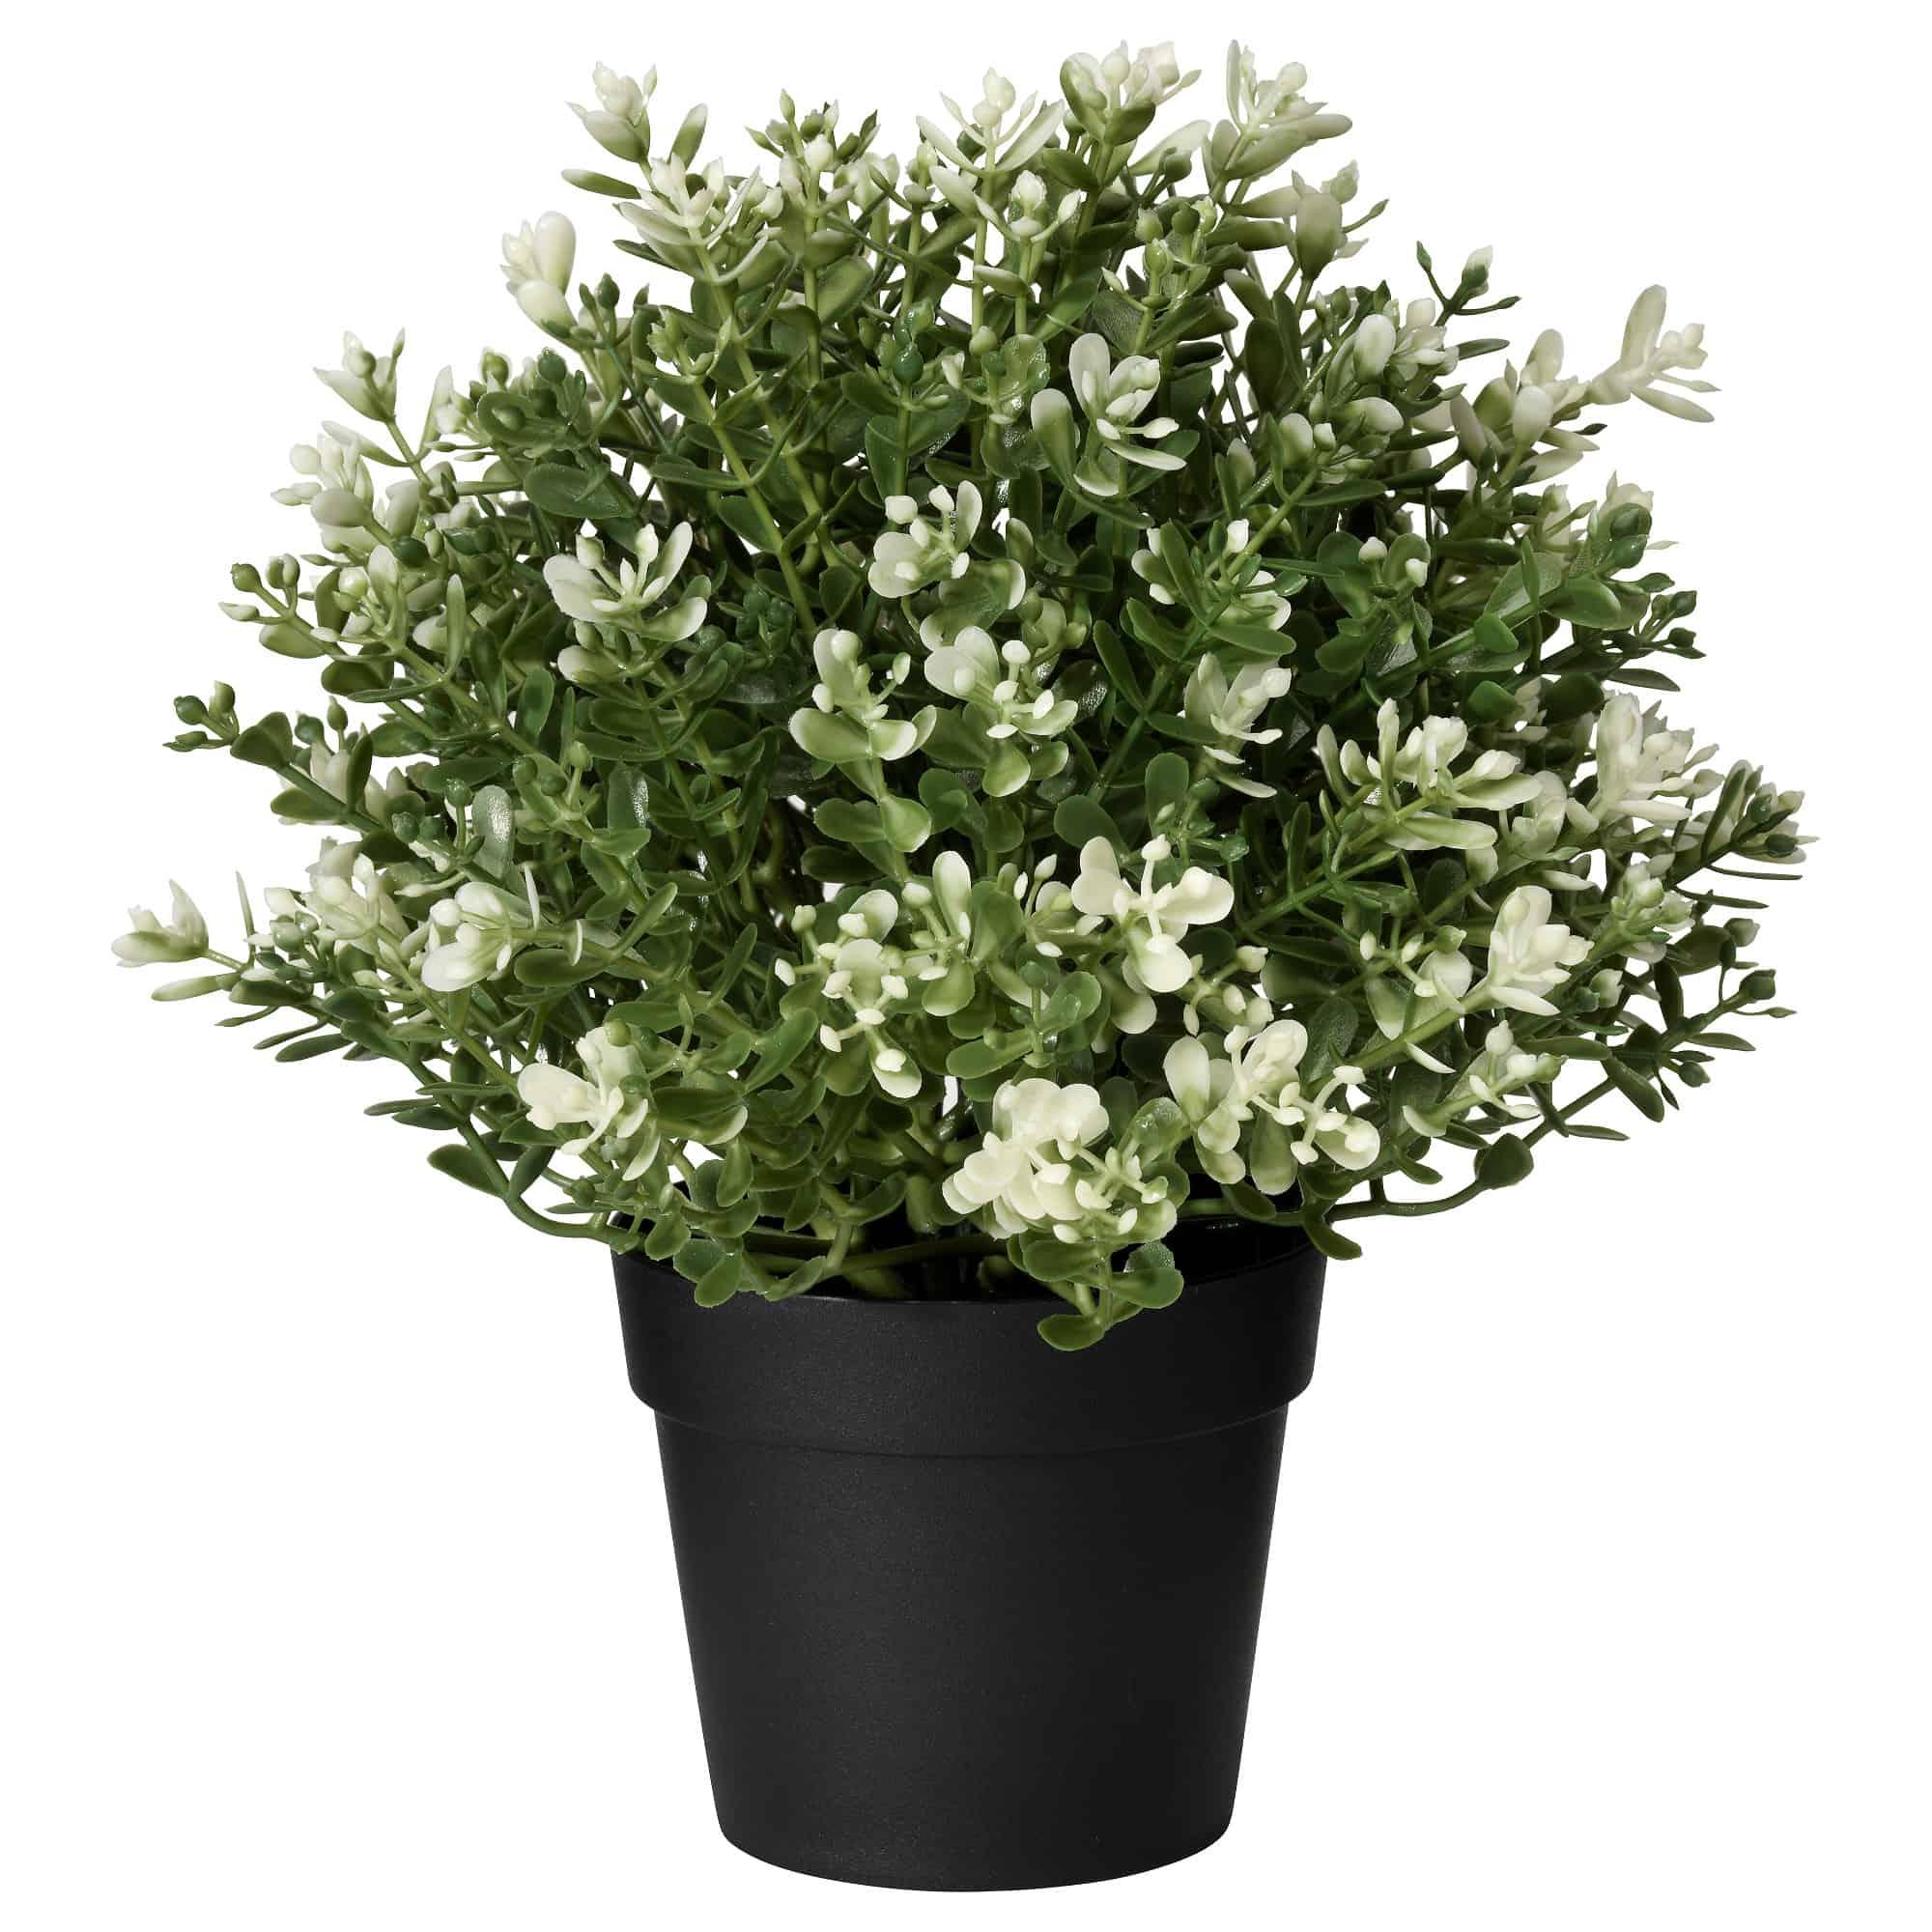 IKEA FEJKA thyme plant